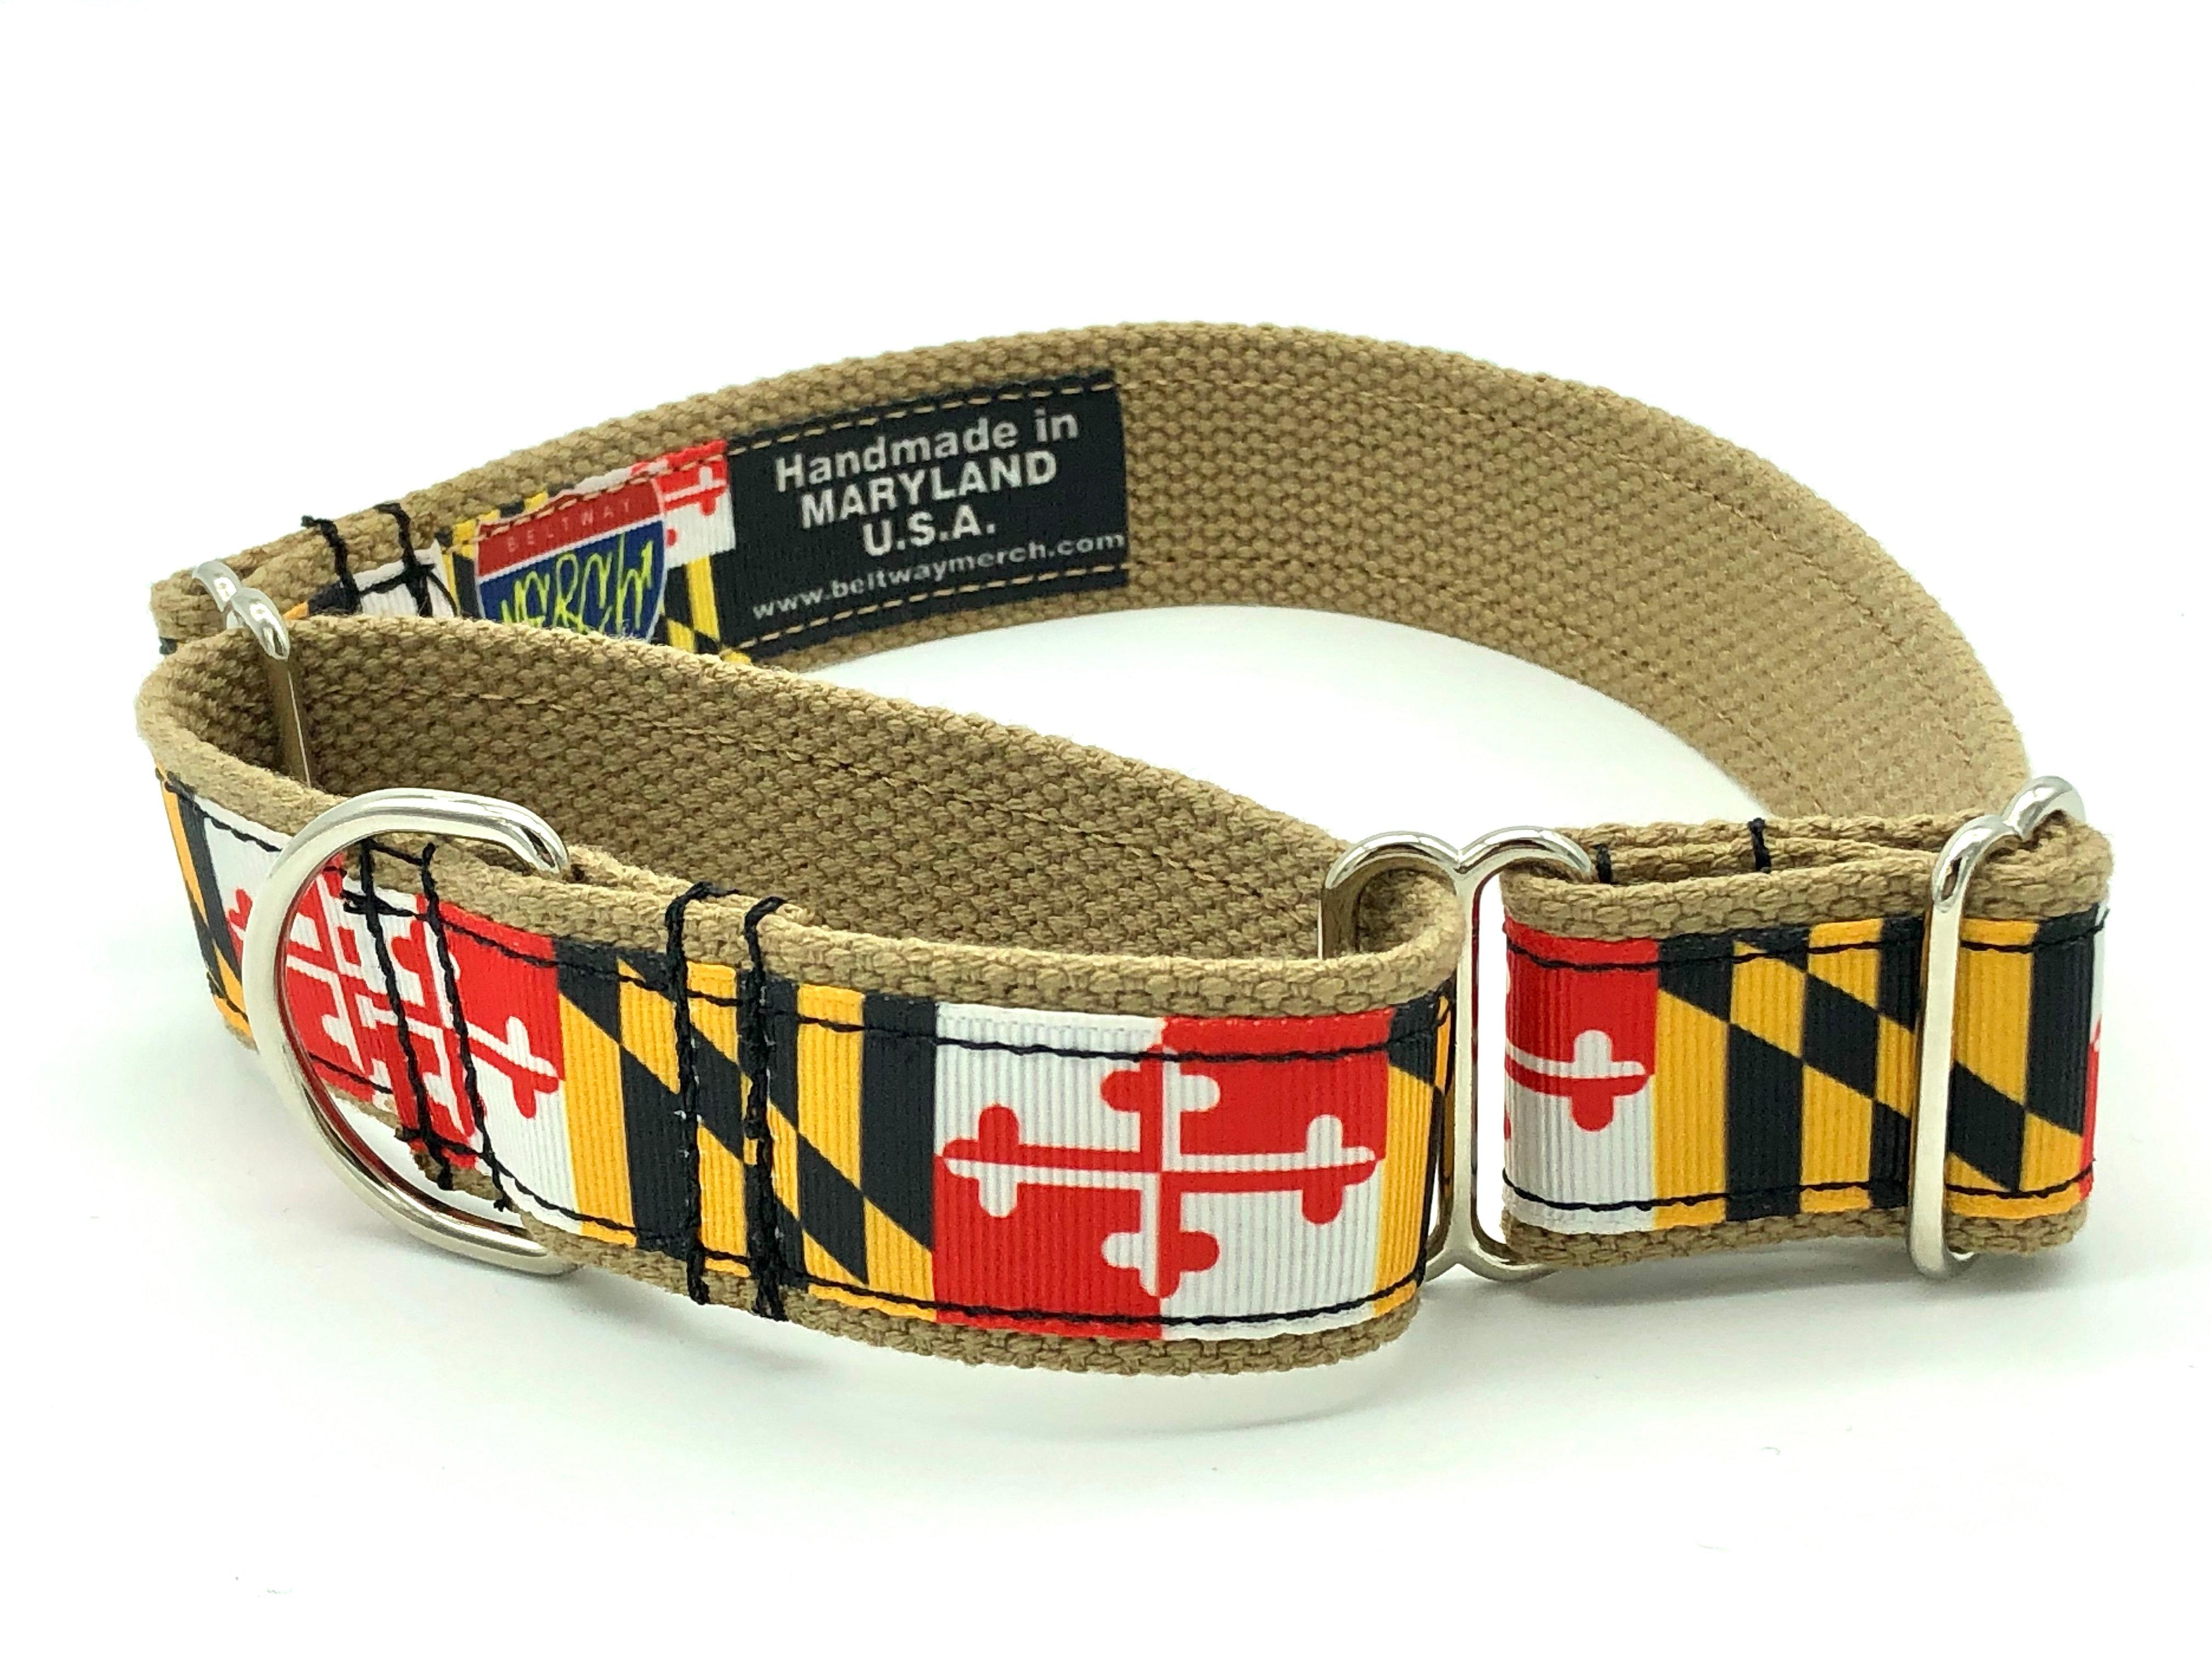 Maryland Flag Dog Collar  Maryland Flag Collar  University of Maryland  Maryland Pride  SmMed-MedLarge  1 inch wide  Matching Leash